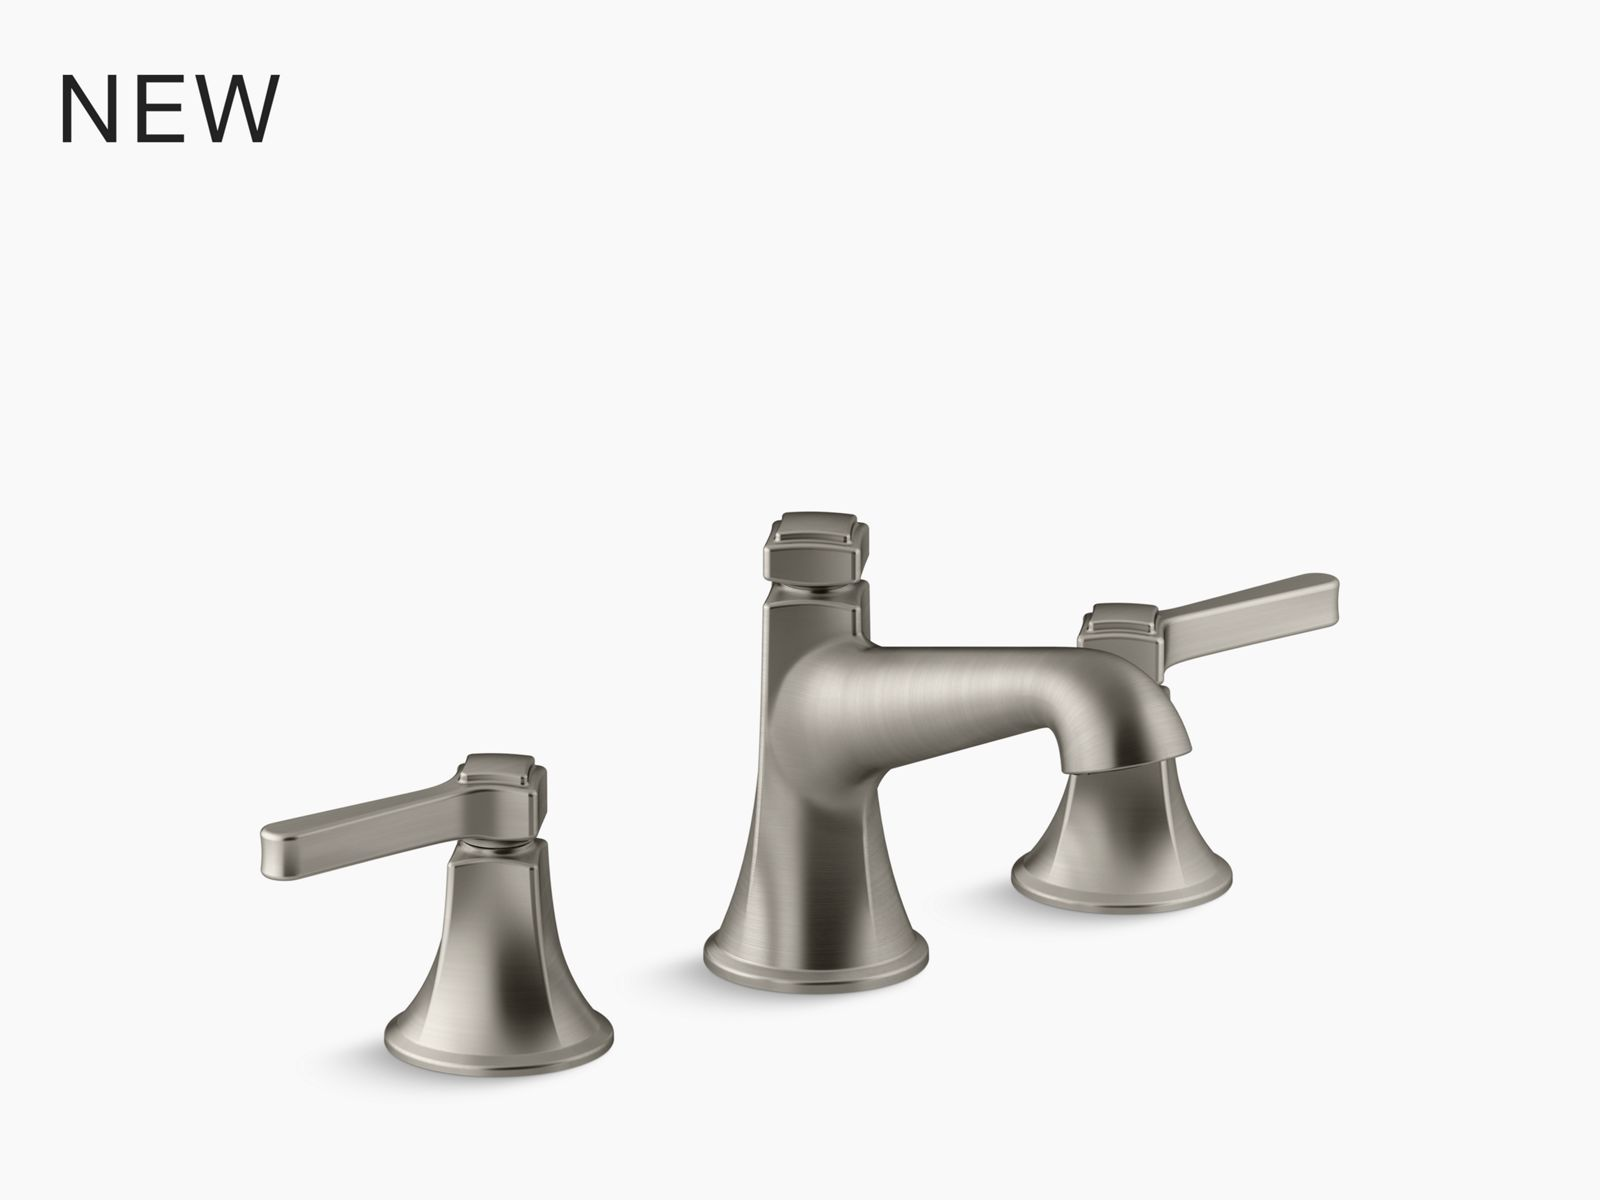 hint single handle bathroom sink faucet with escutcheon